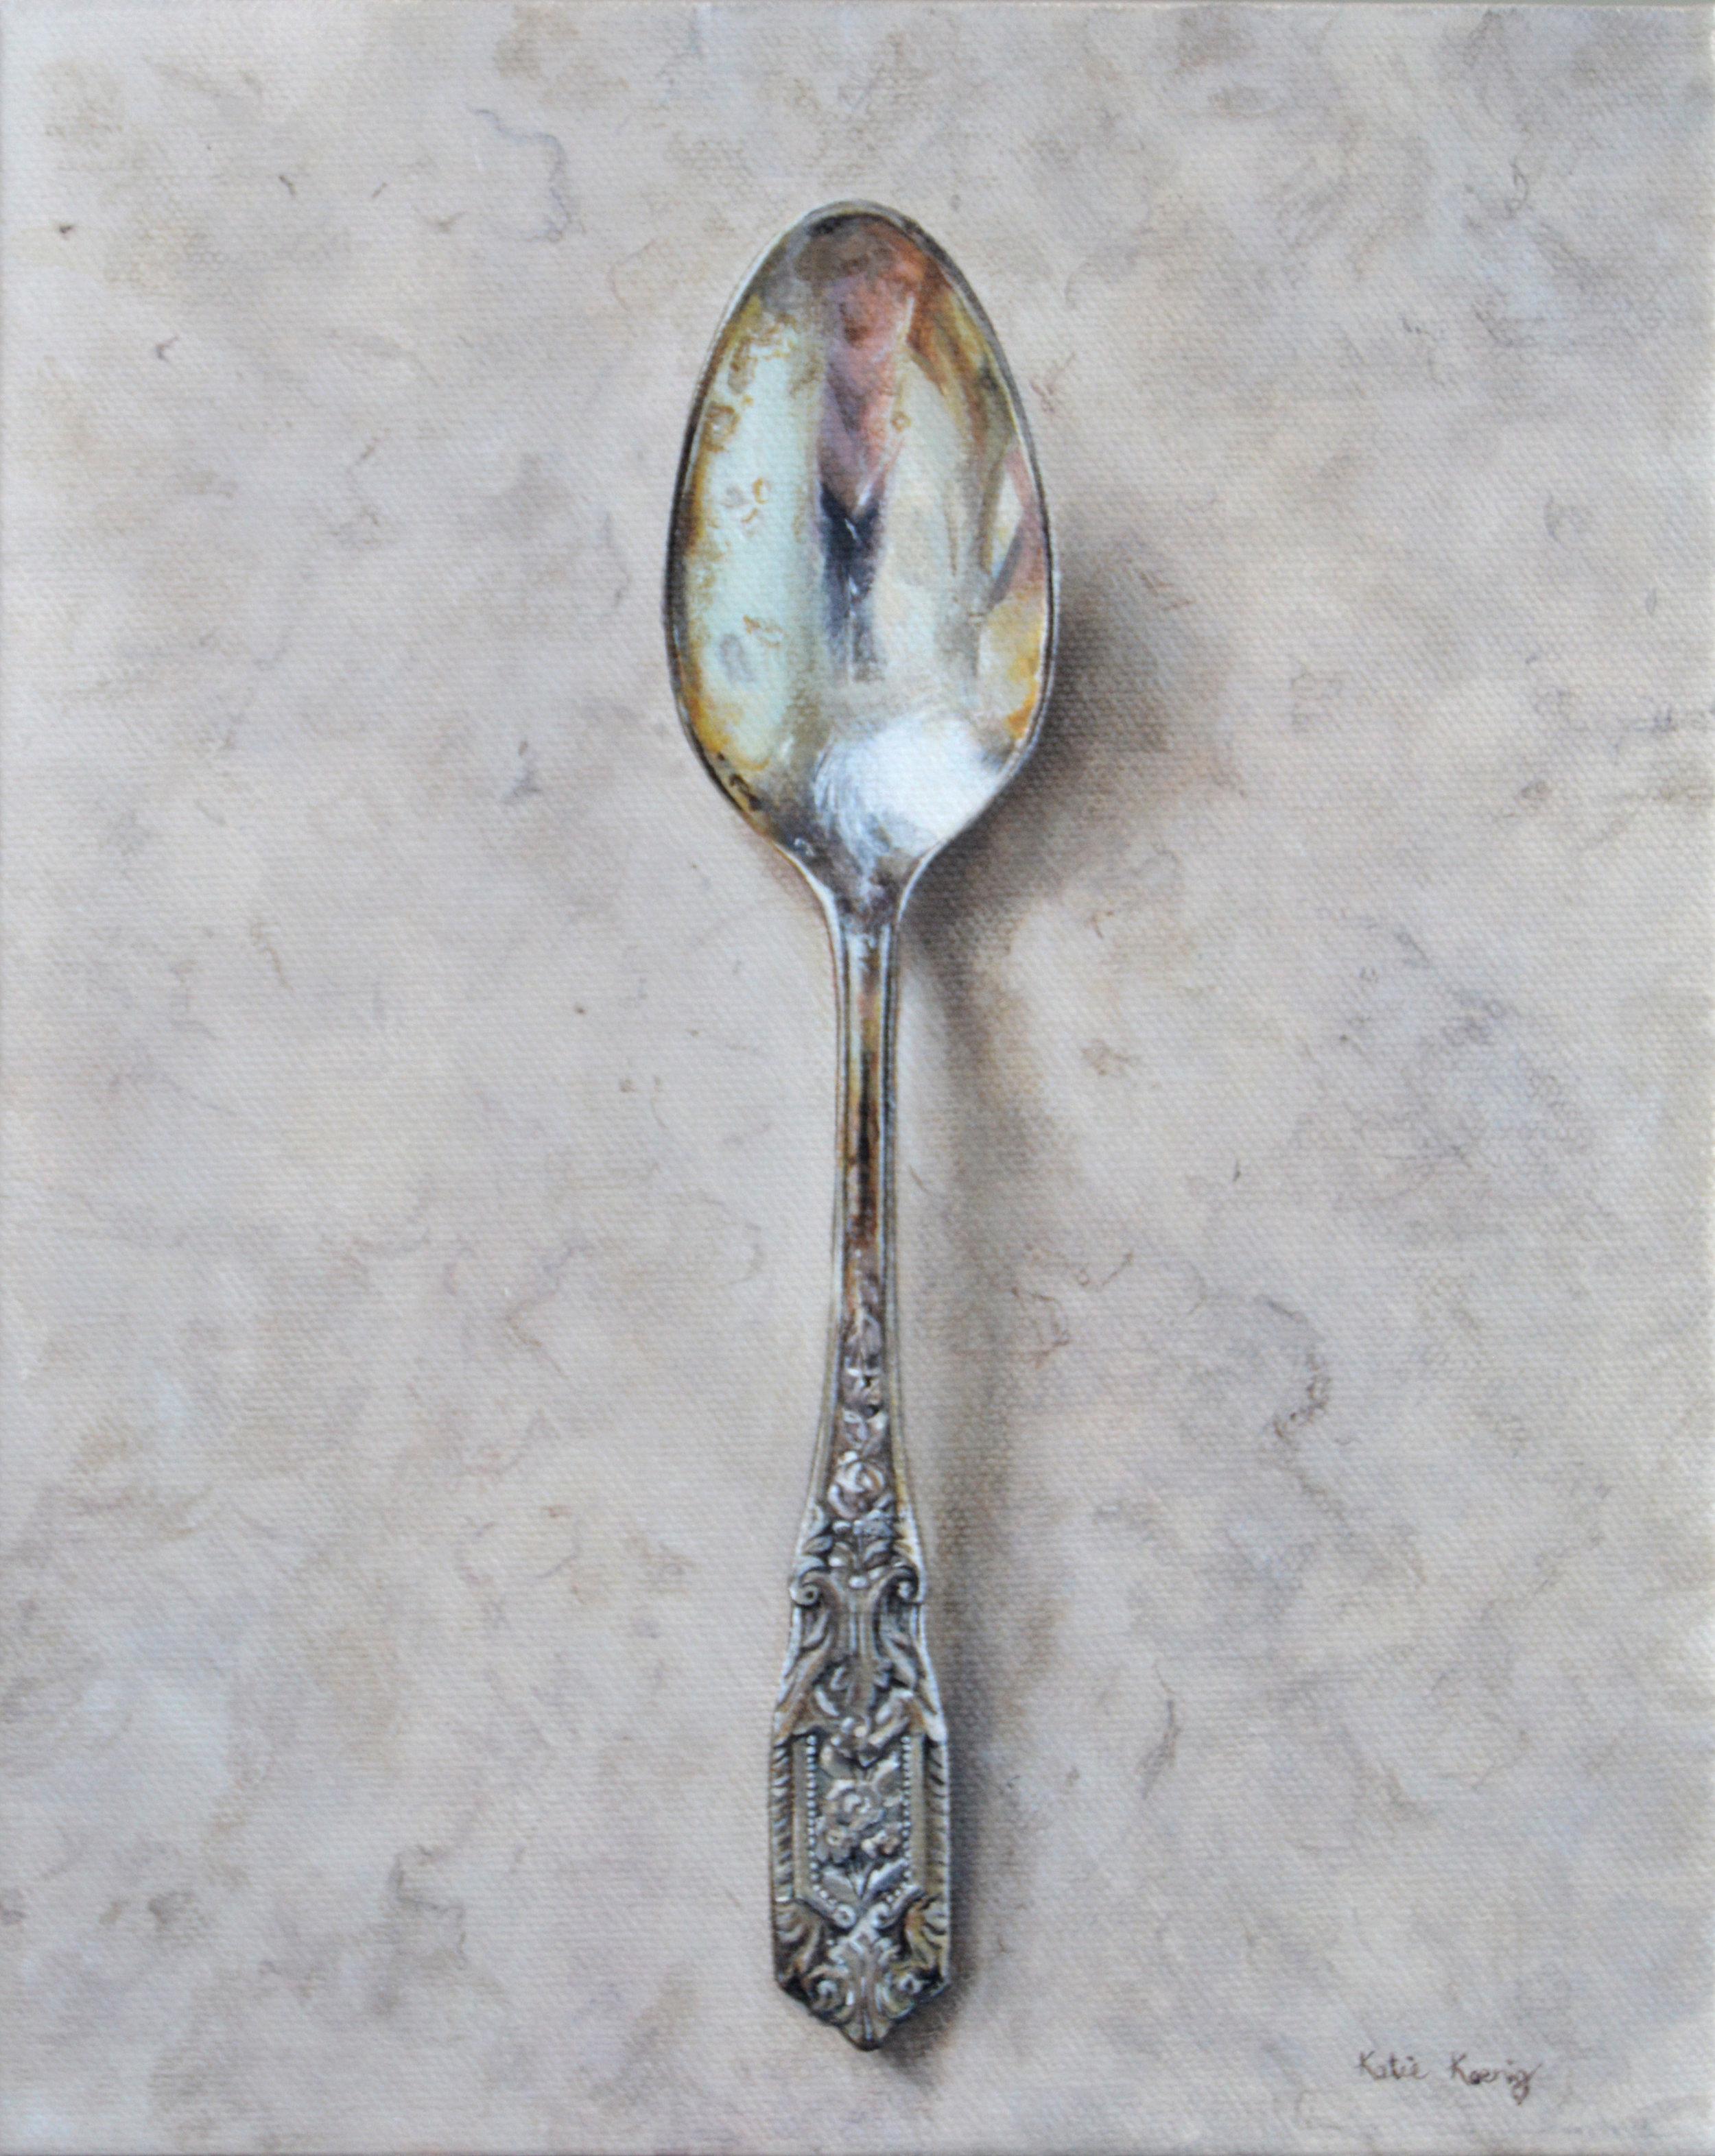 Nana's Spoon